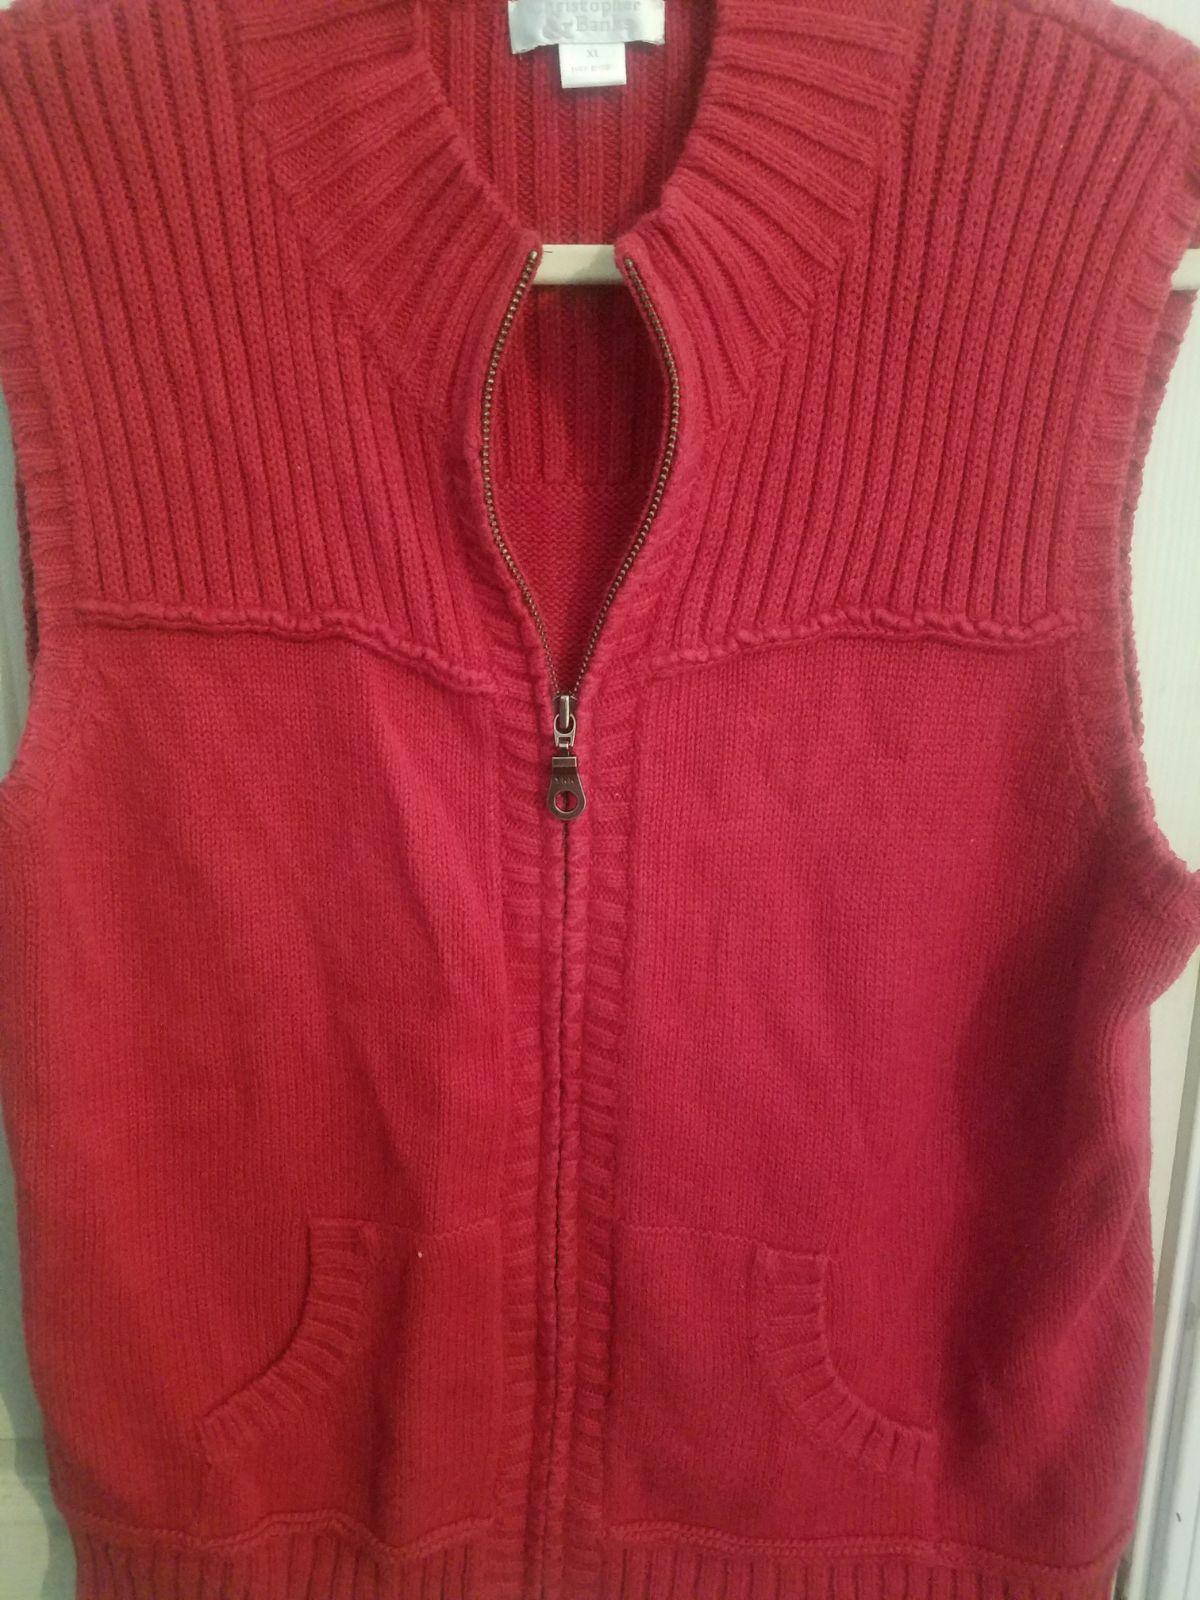 Ladies xlarge sweater vest - Mercari: BUY & SELL THINGS YOU LOVE